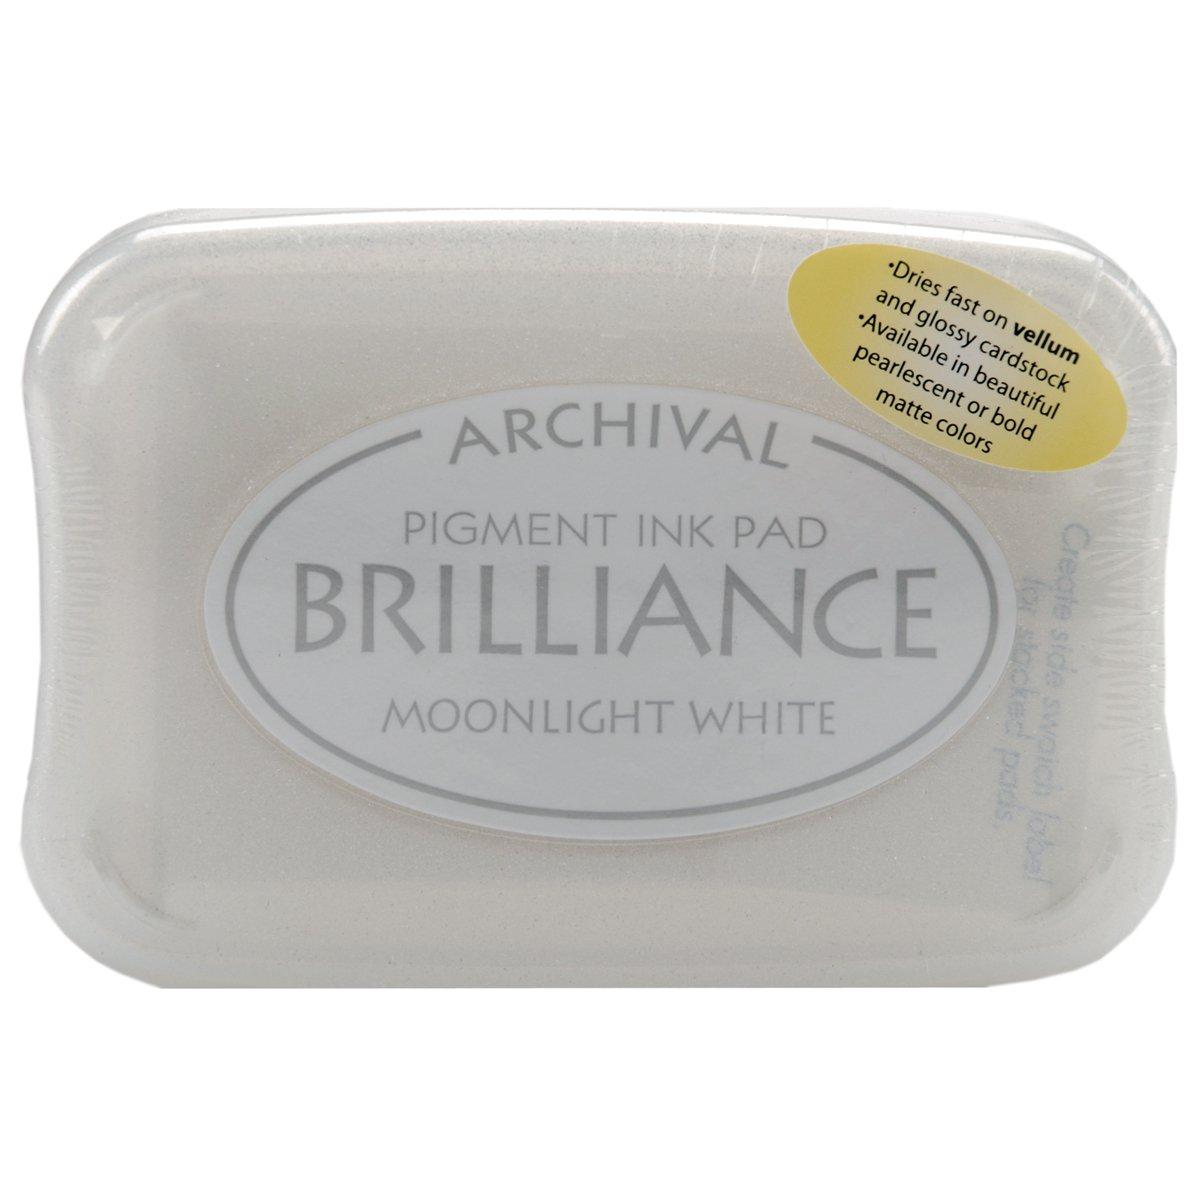 Brilliance Dew Drop Pigment Ink Pad-Moonlight White BD000-80